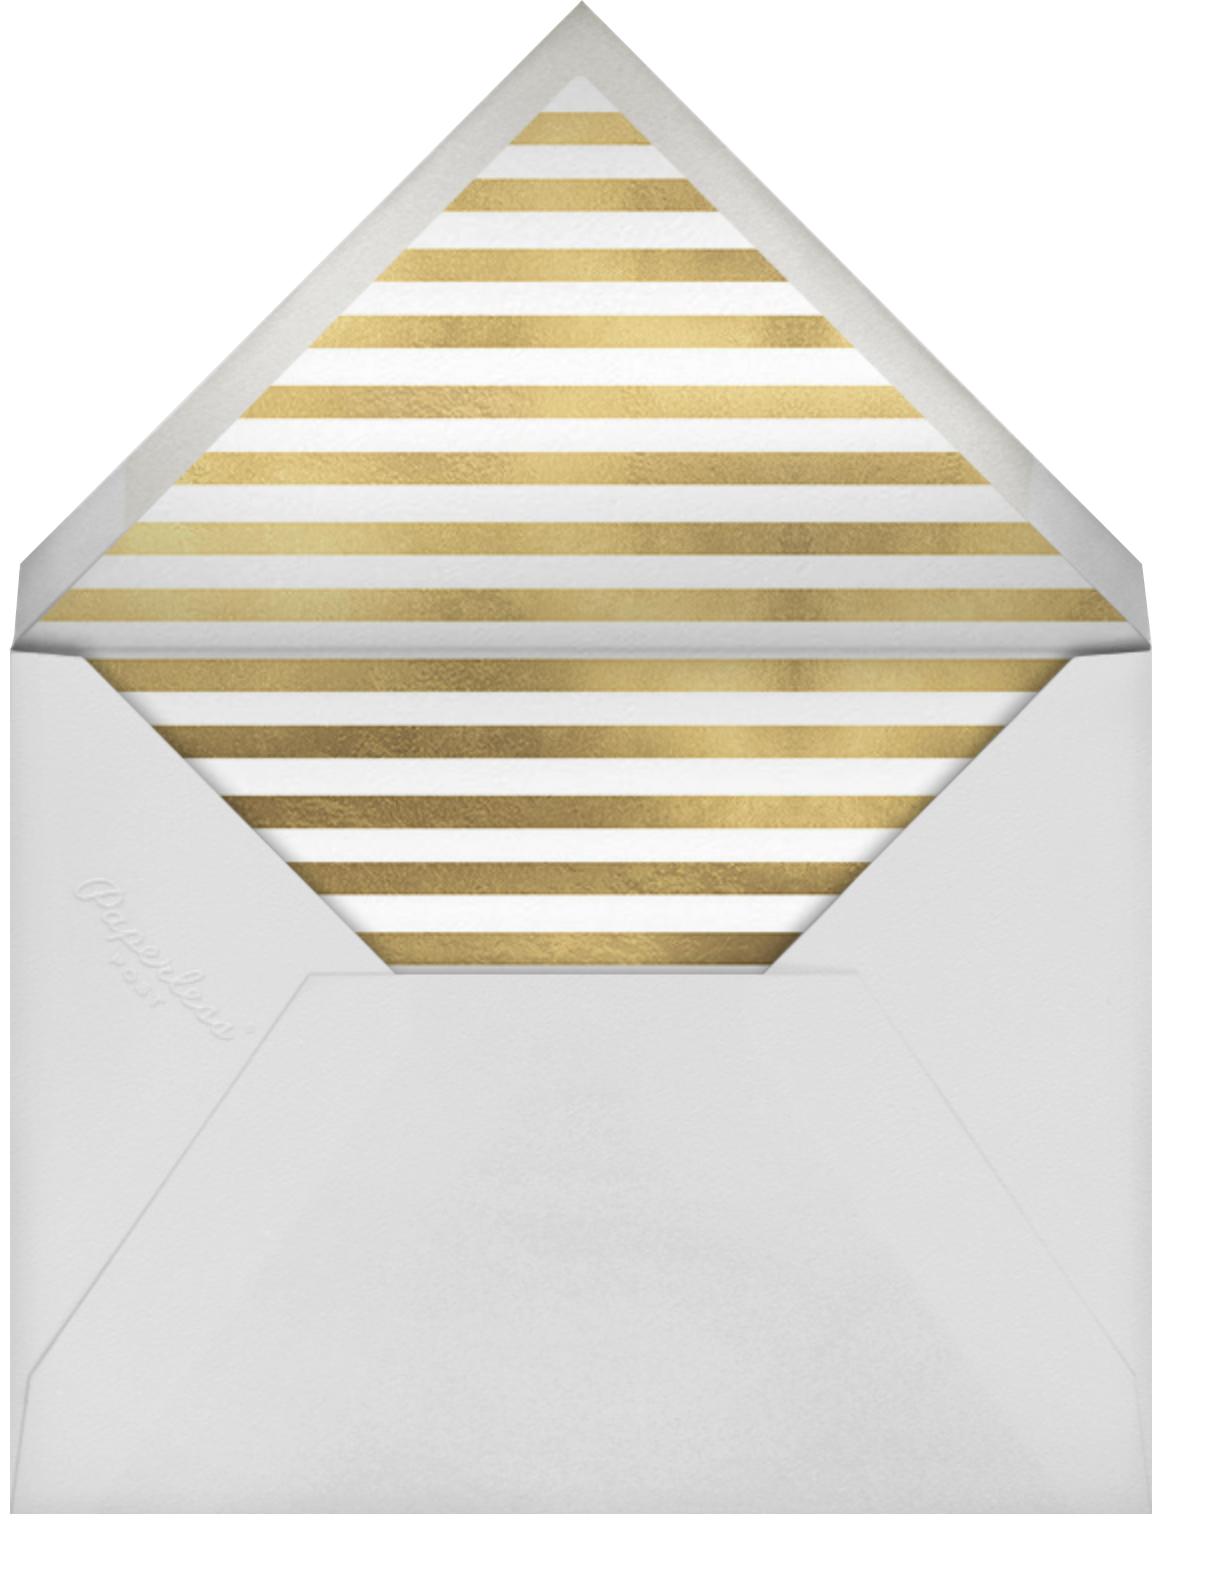 Fortune - kate spade new york - Envelope